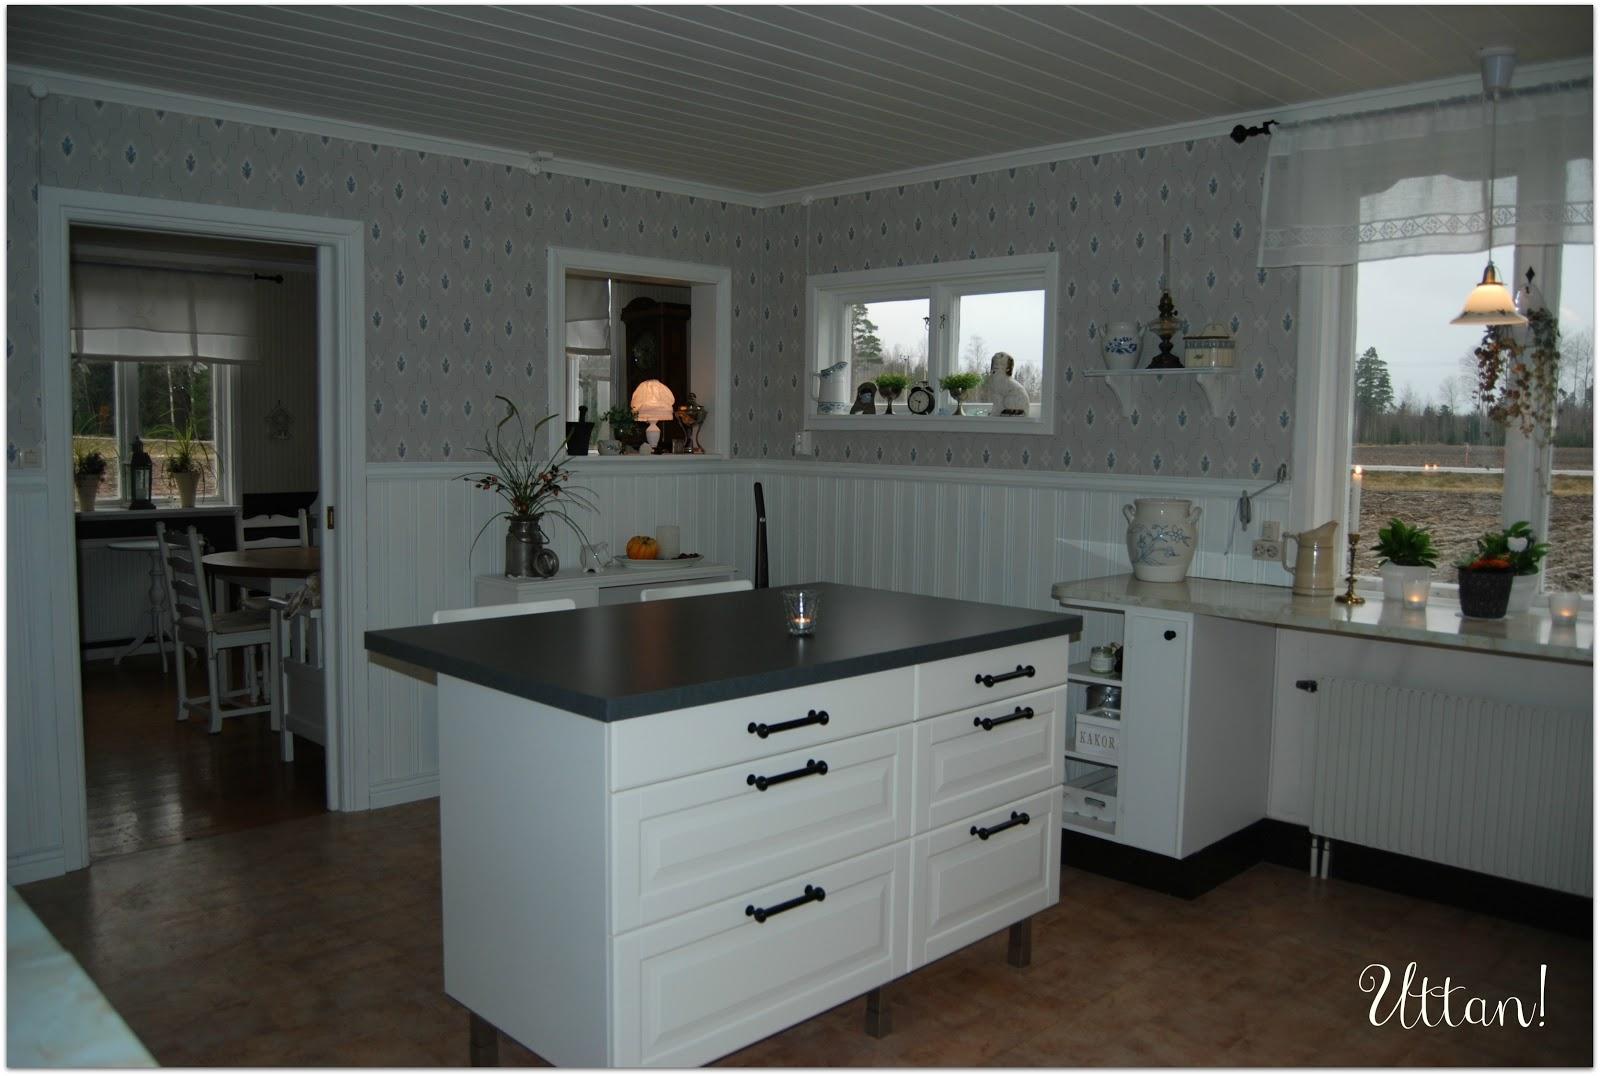 Köket bilder ~ zeedub.com